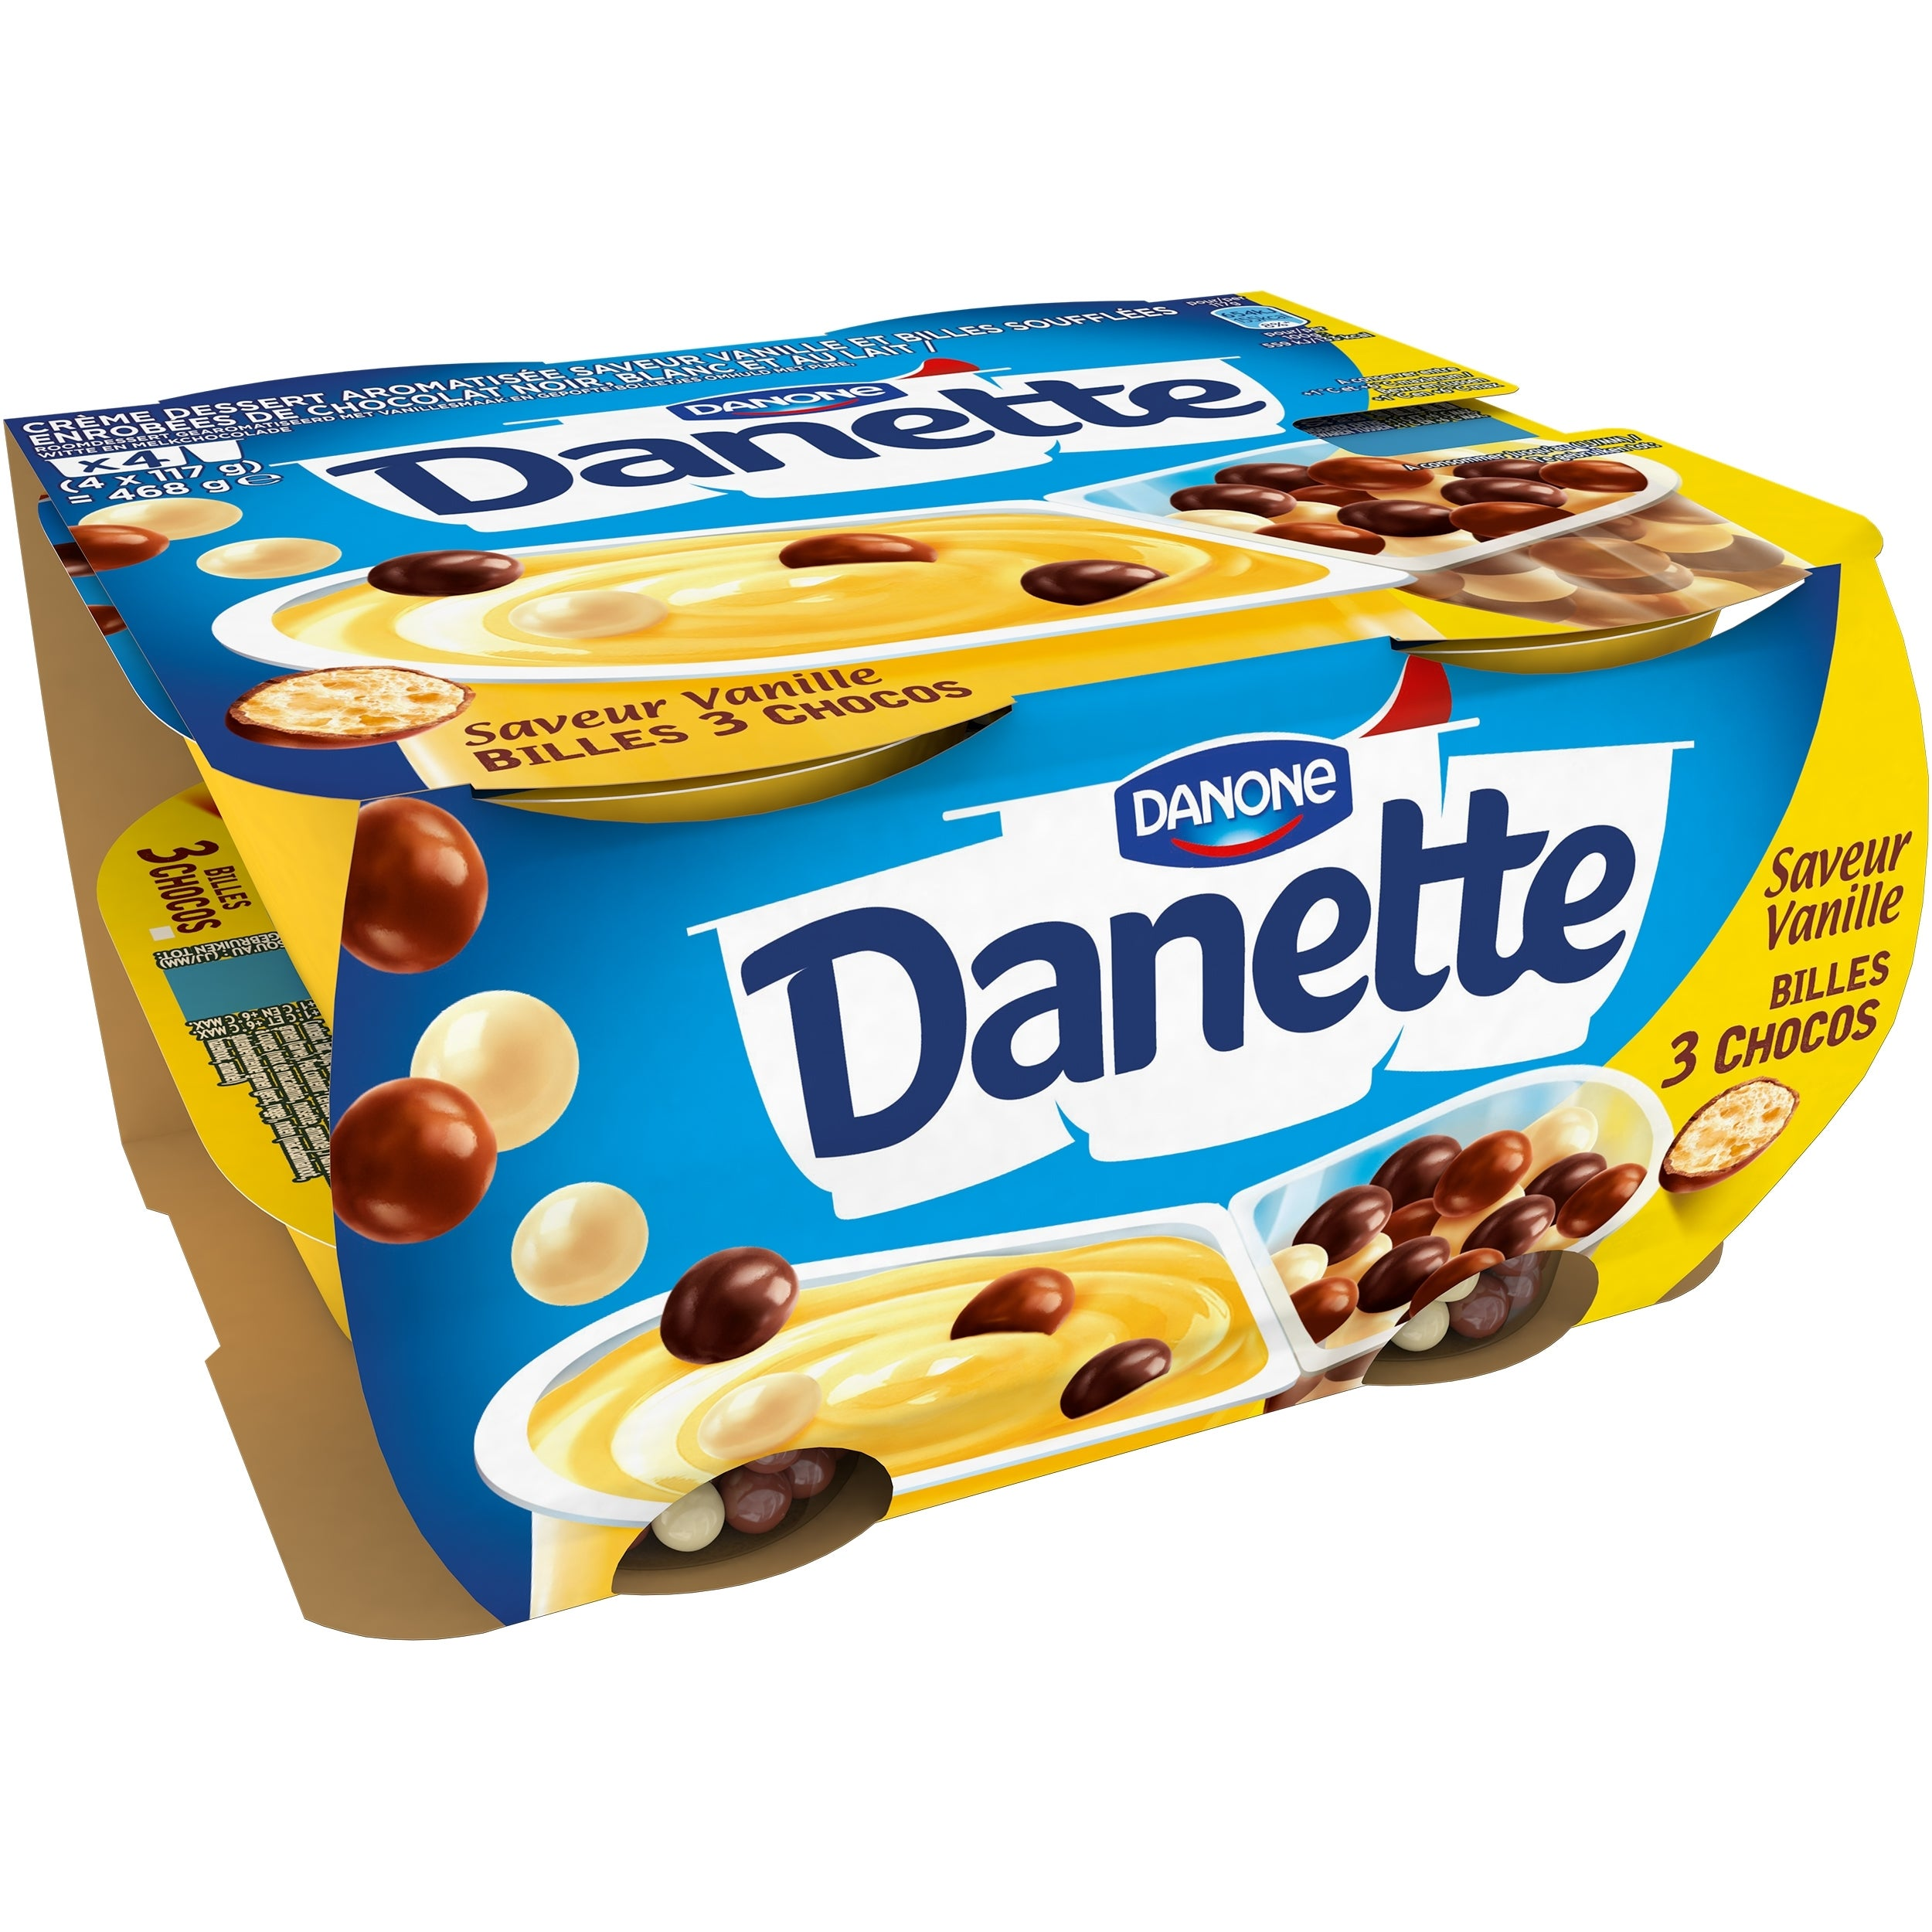 Danette POP Vanille 4x117g